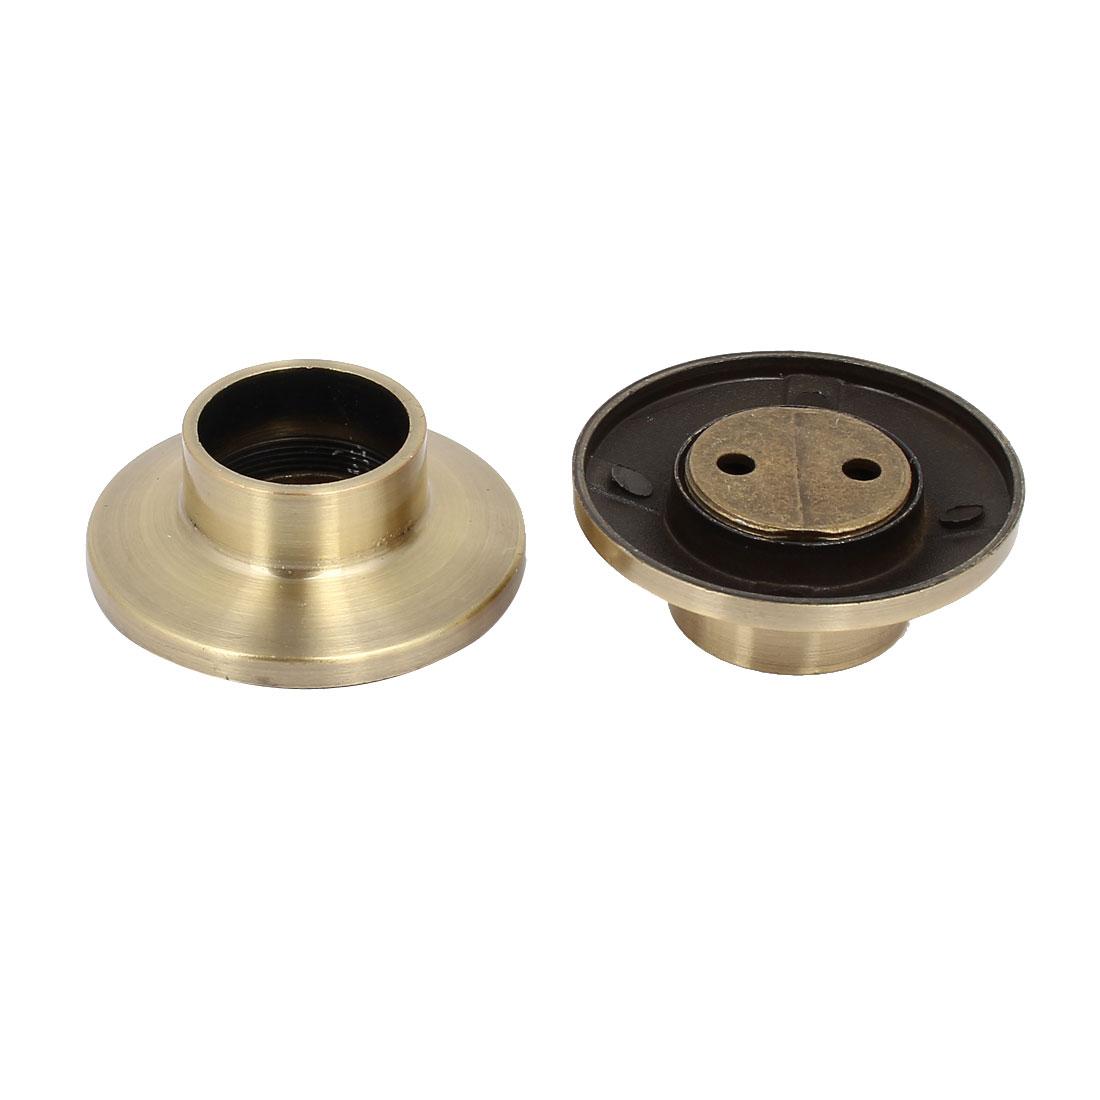 Wardrobe Cupboard Metal Rail Rod End Supports Bracket Socket Bronze Tone 2pcs